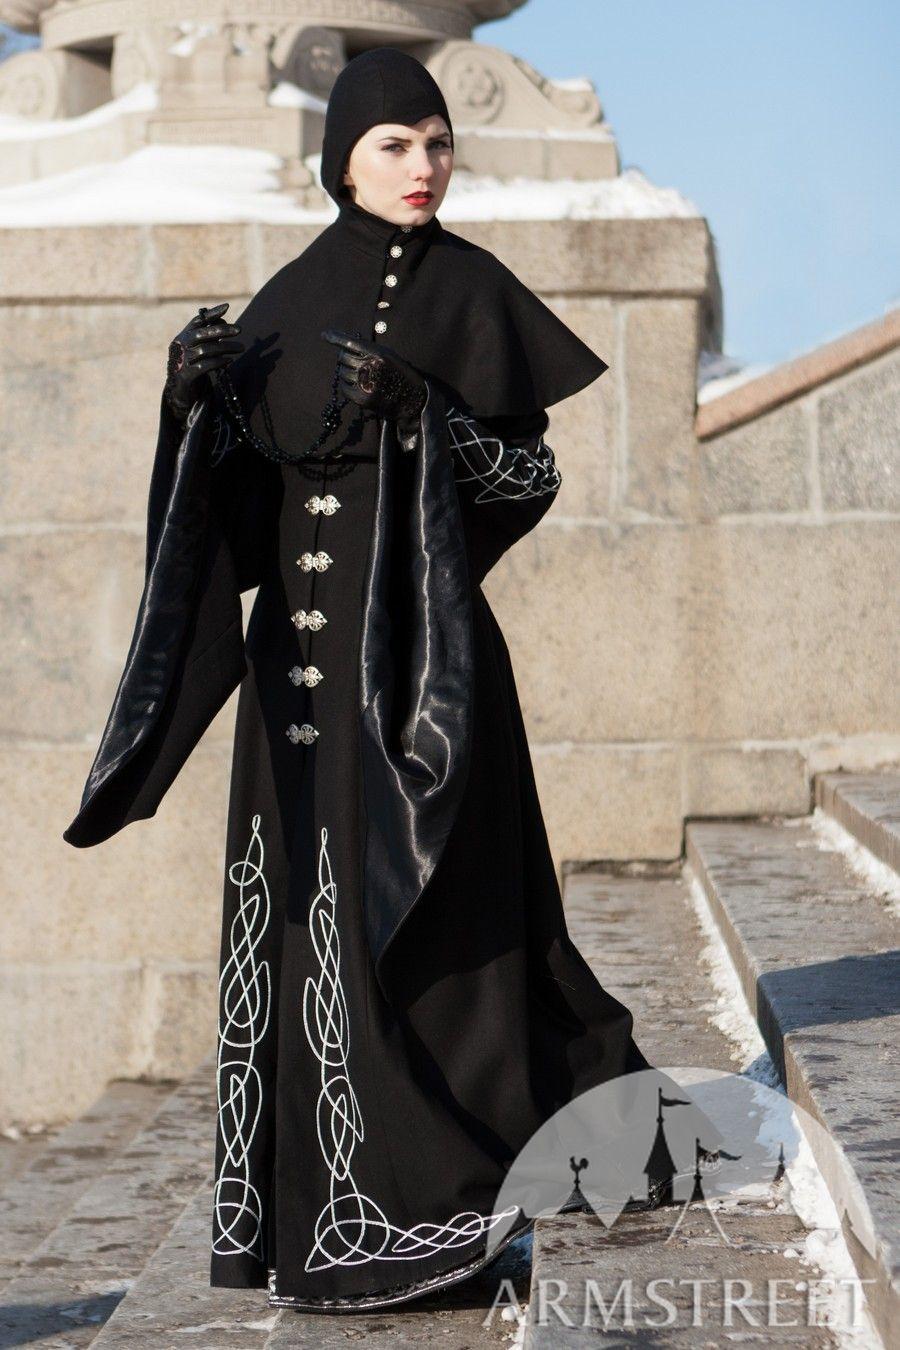 Exclusive long woolen cloak with hood Blackbird by ArmStreet for